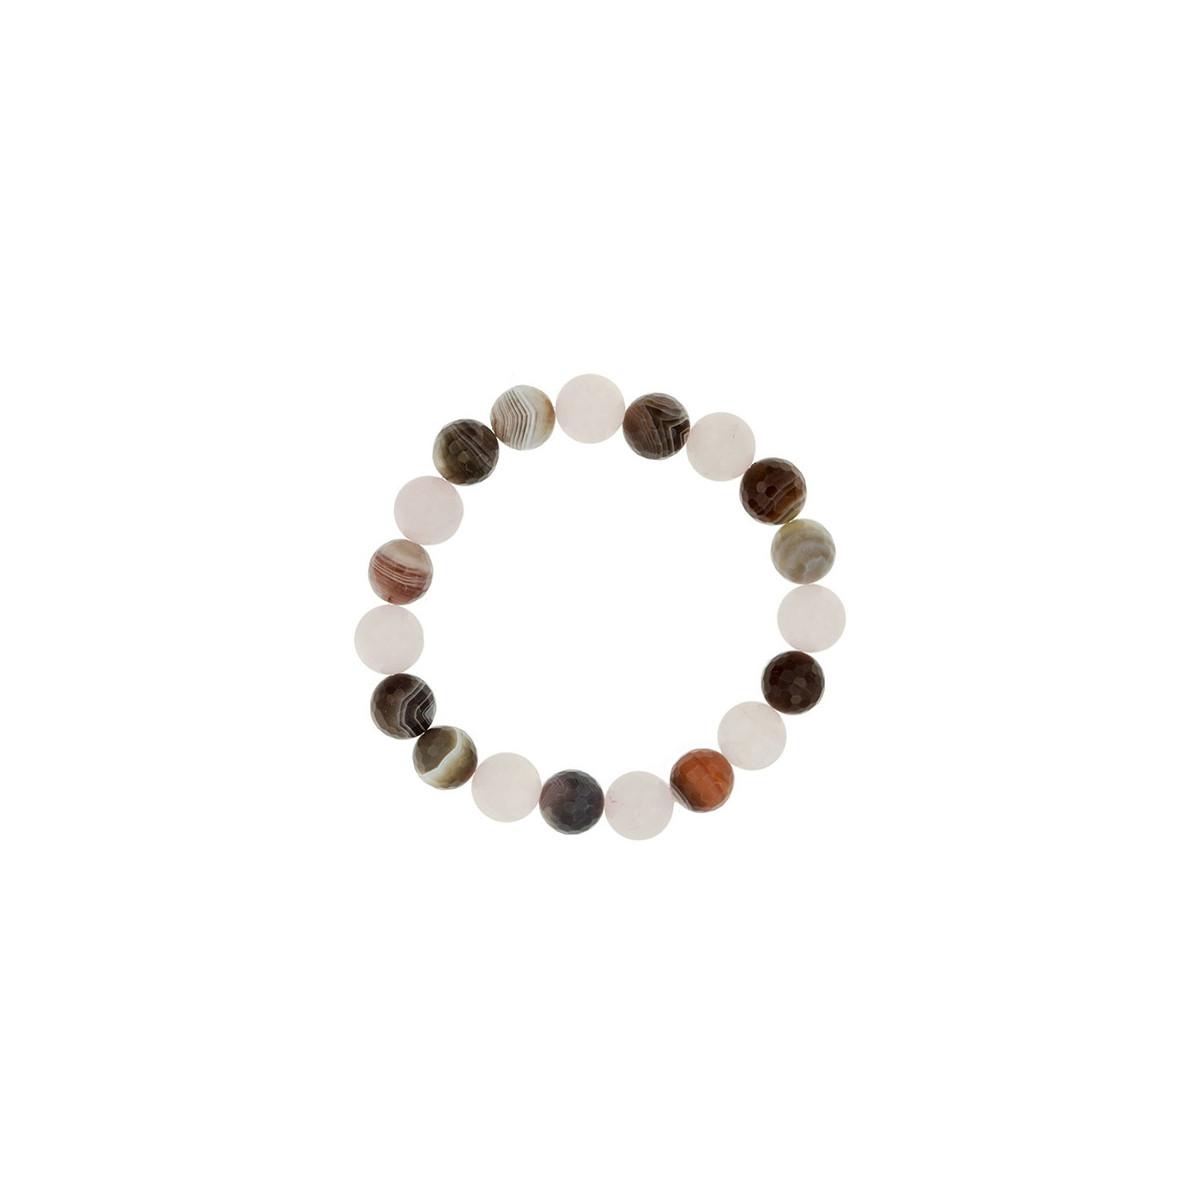 Arrecife Collection - Pulsera Cuarzo - Agata Botsuana